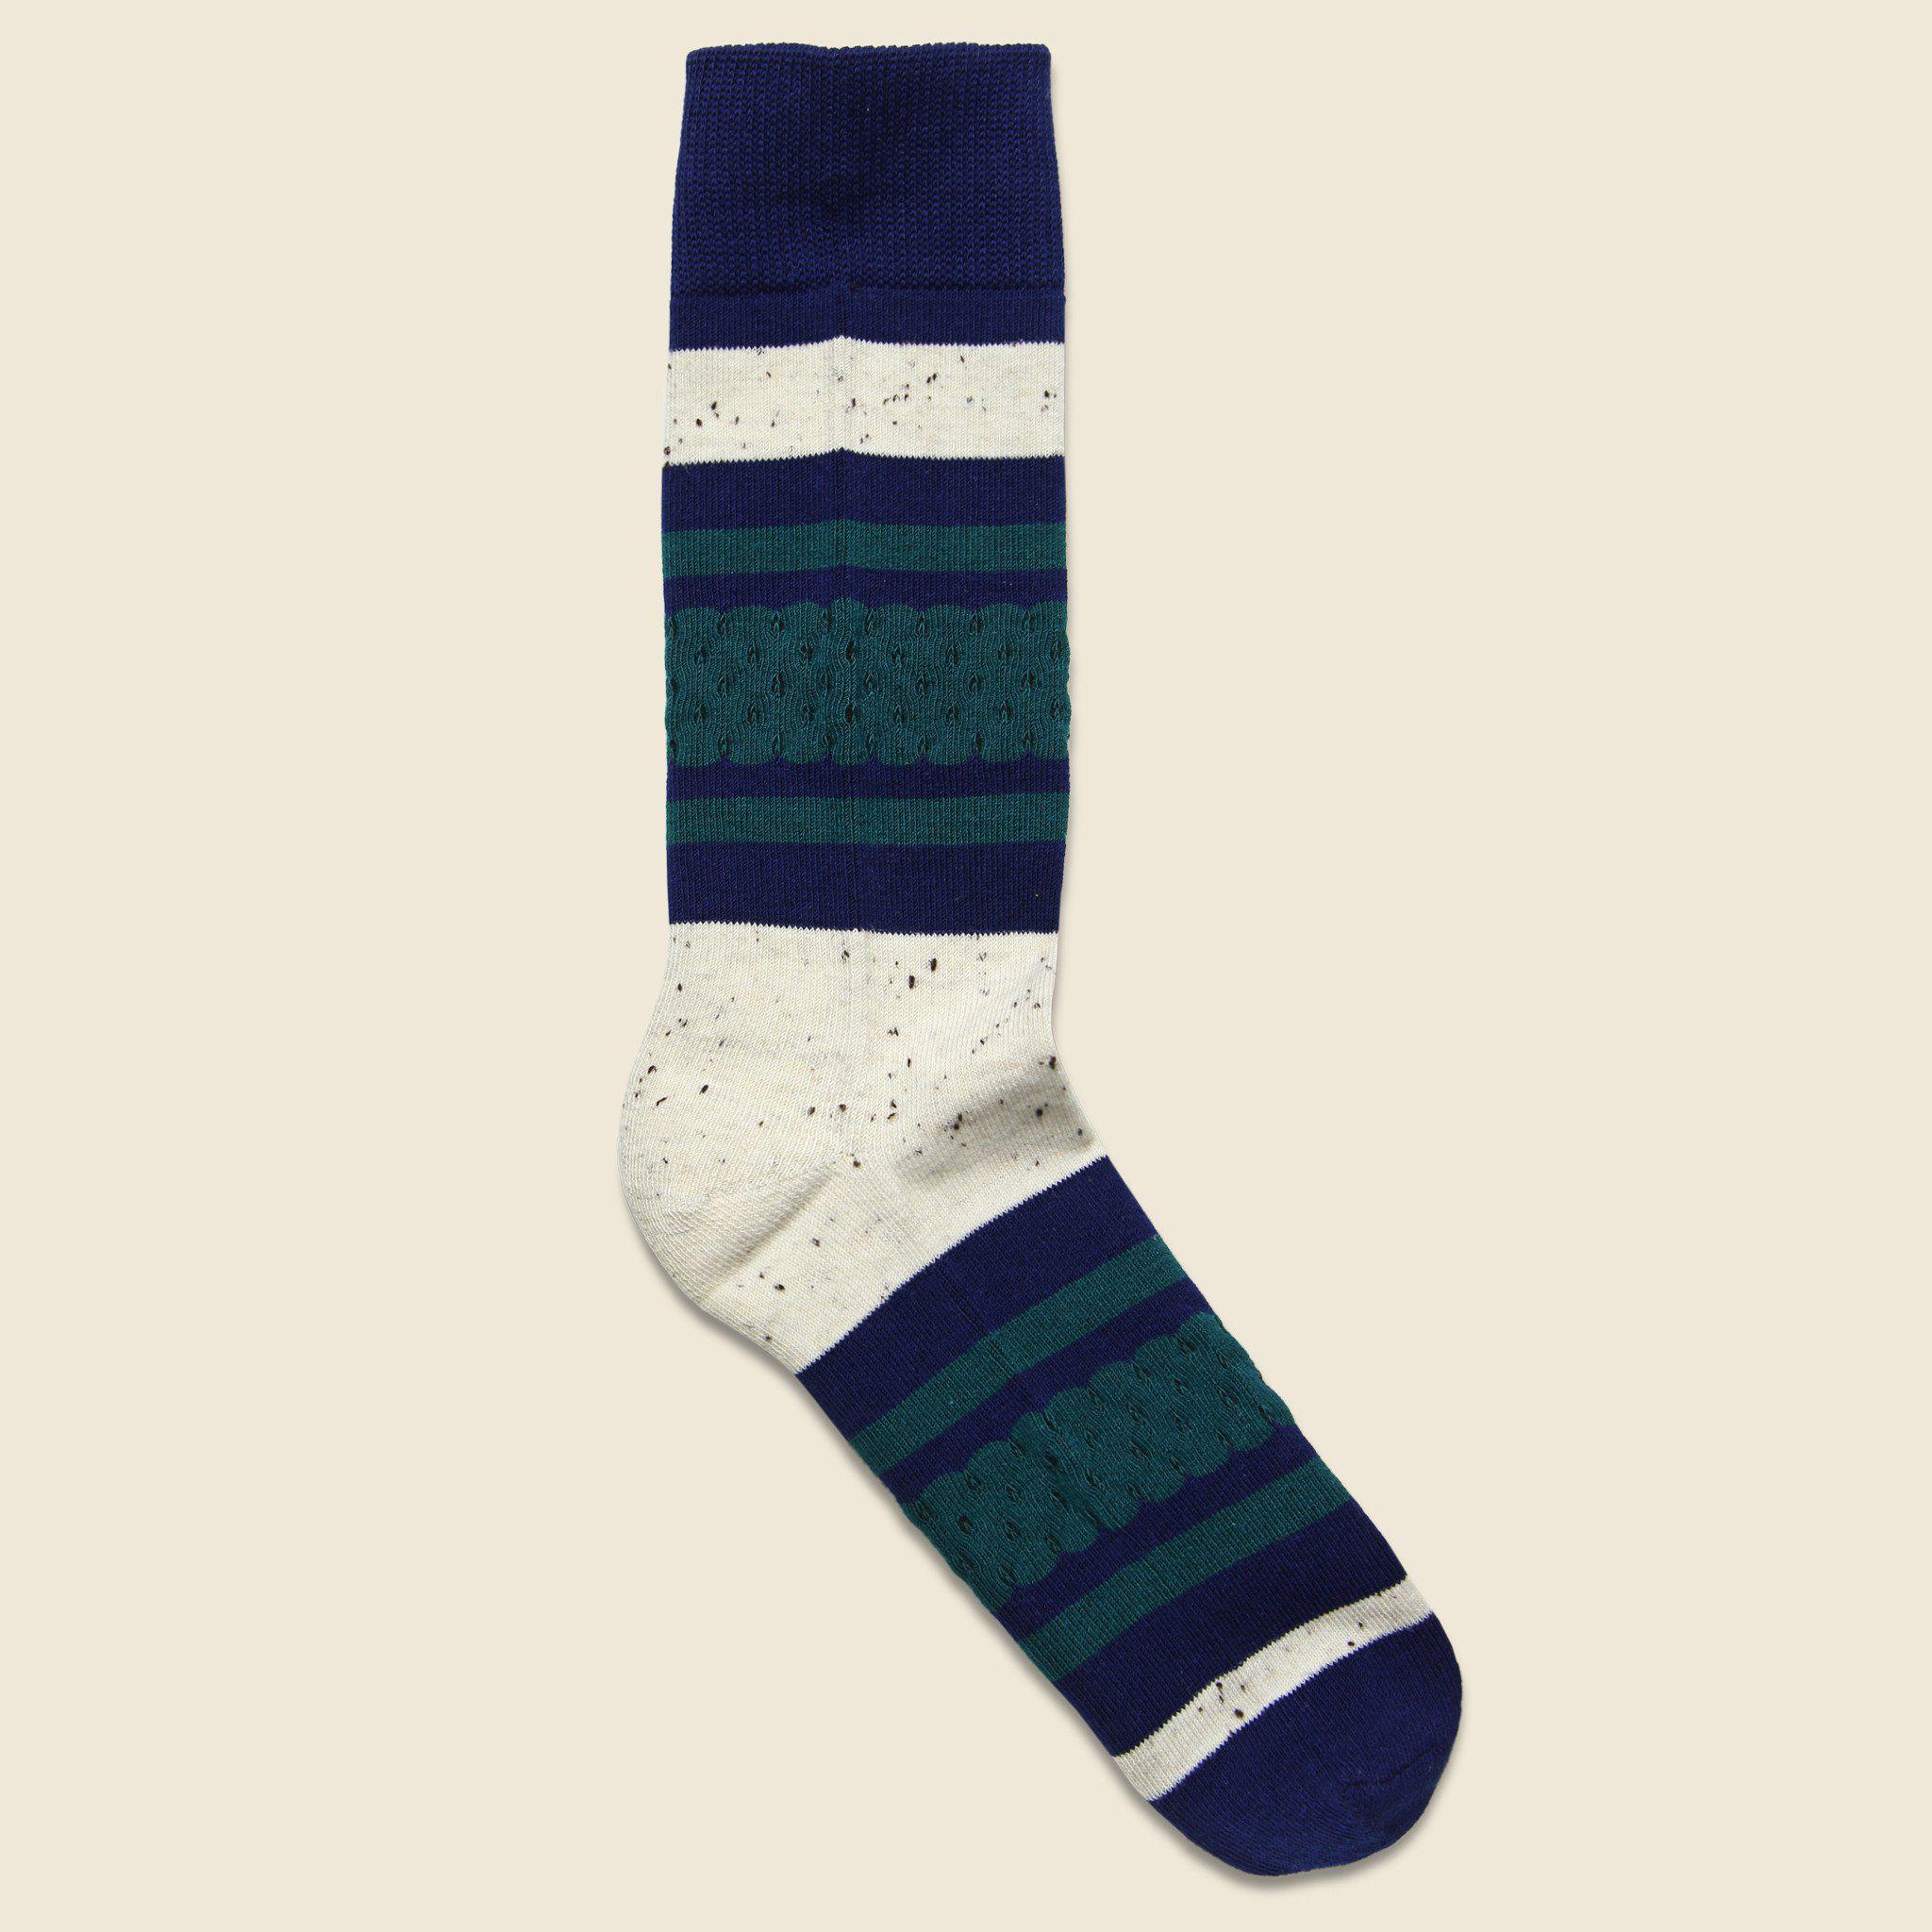 Lyst - Richer Poorer Provence Classic Lightweight Sock - Blue/cream in Blue for Men